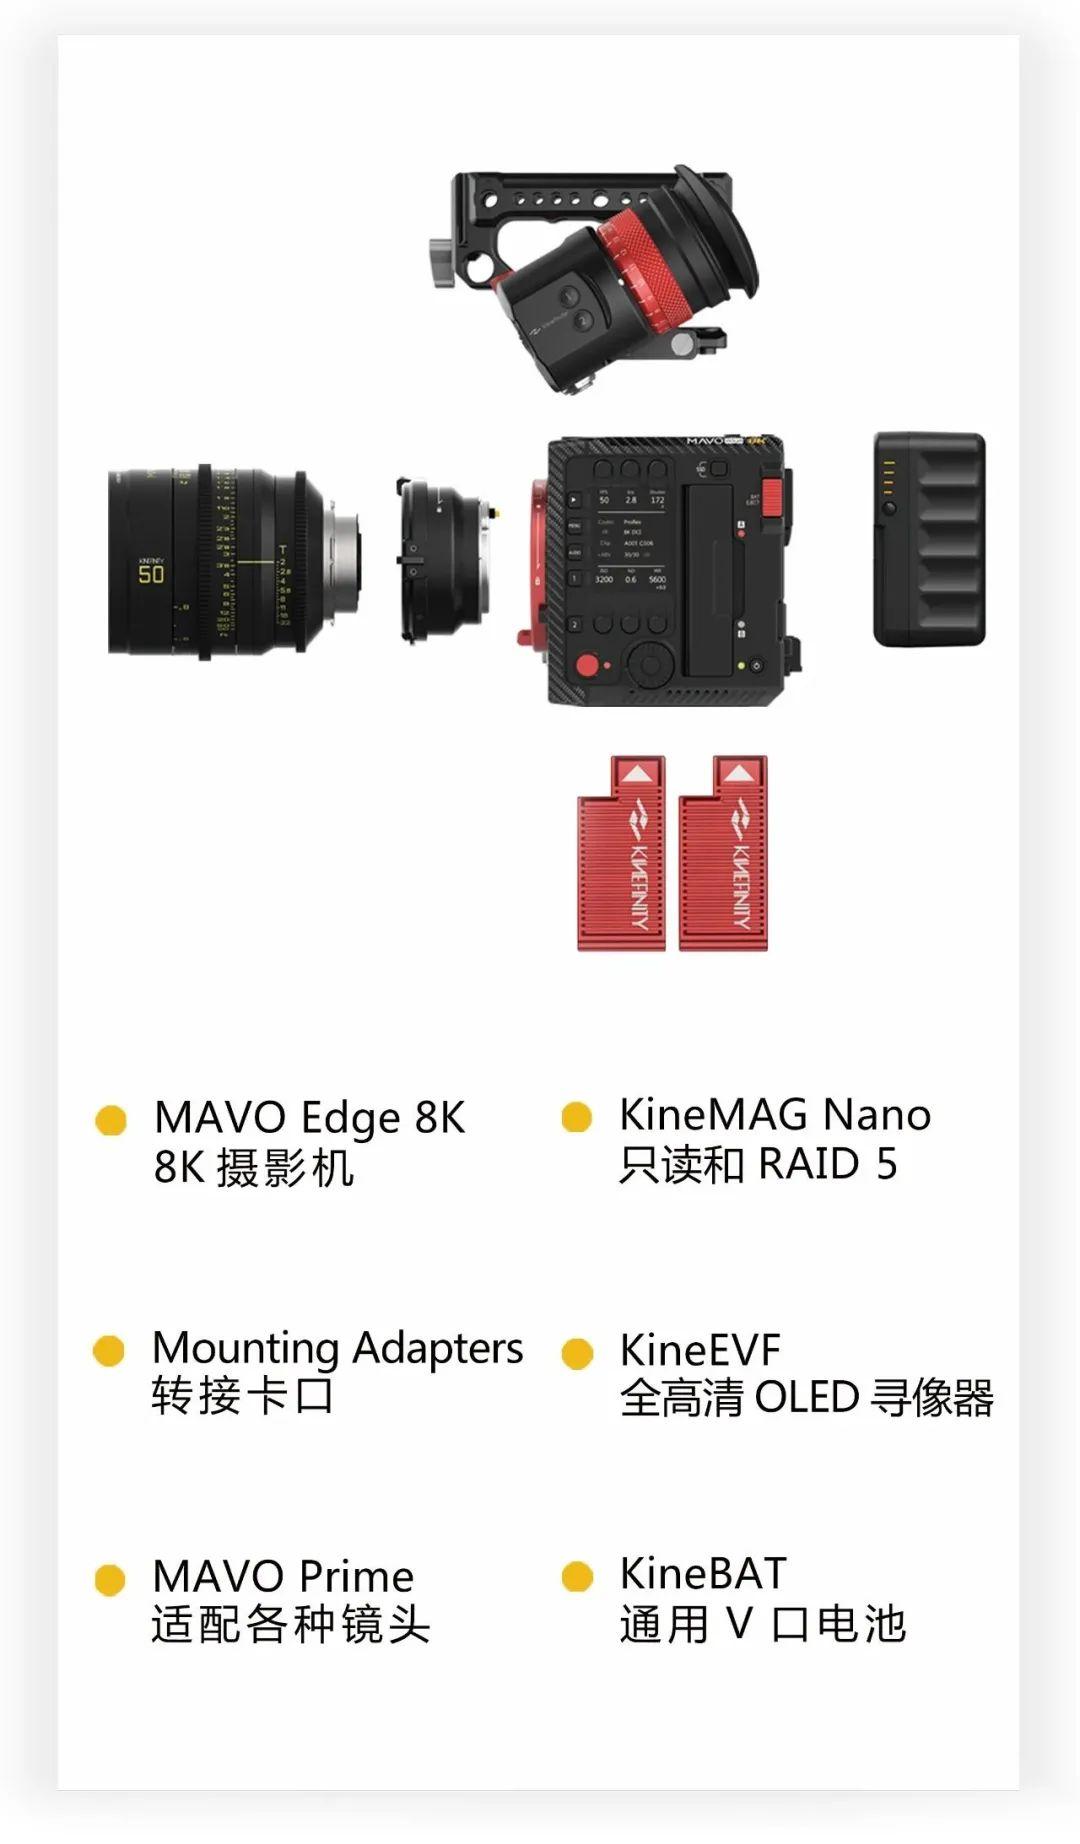 MAVO Edge 8K 正式发售! 8K摄影机 第9张